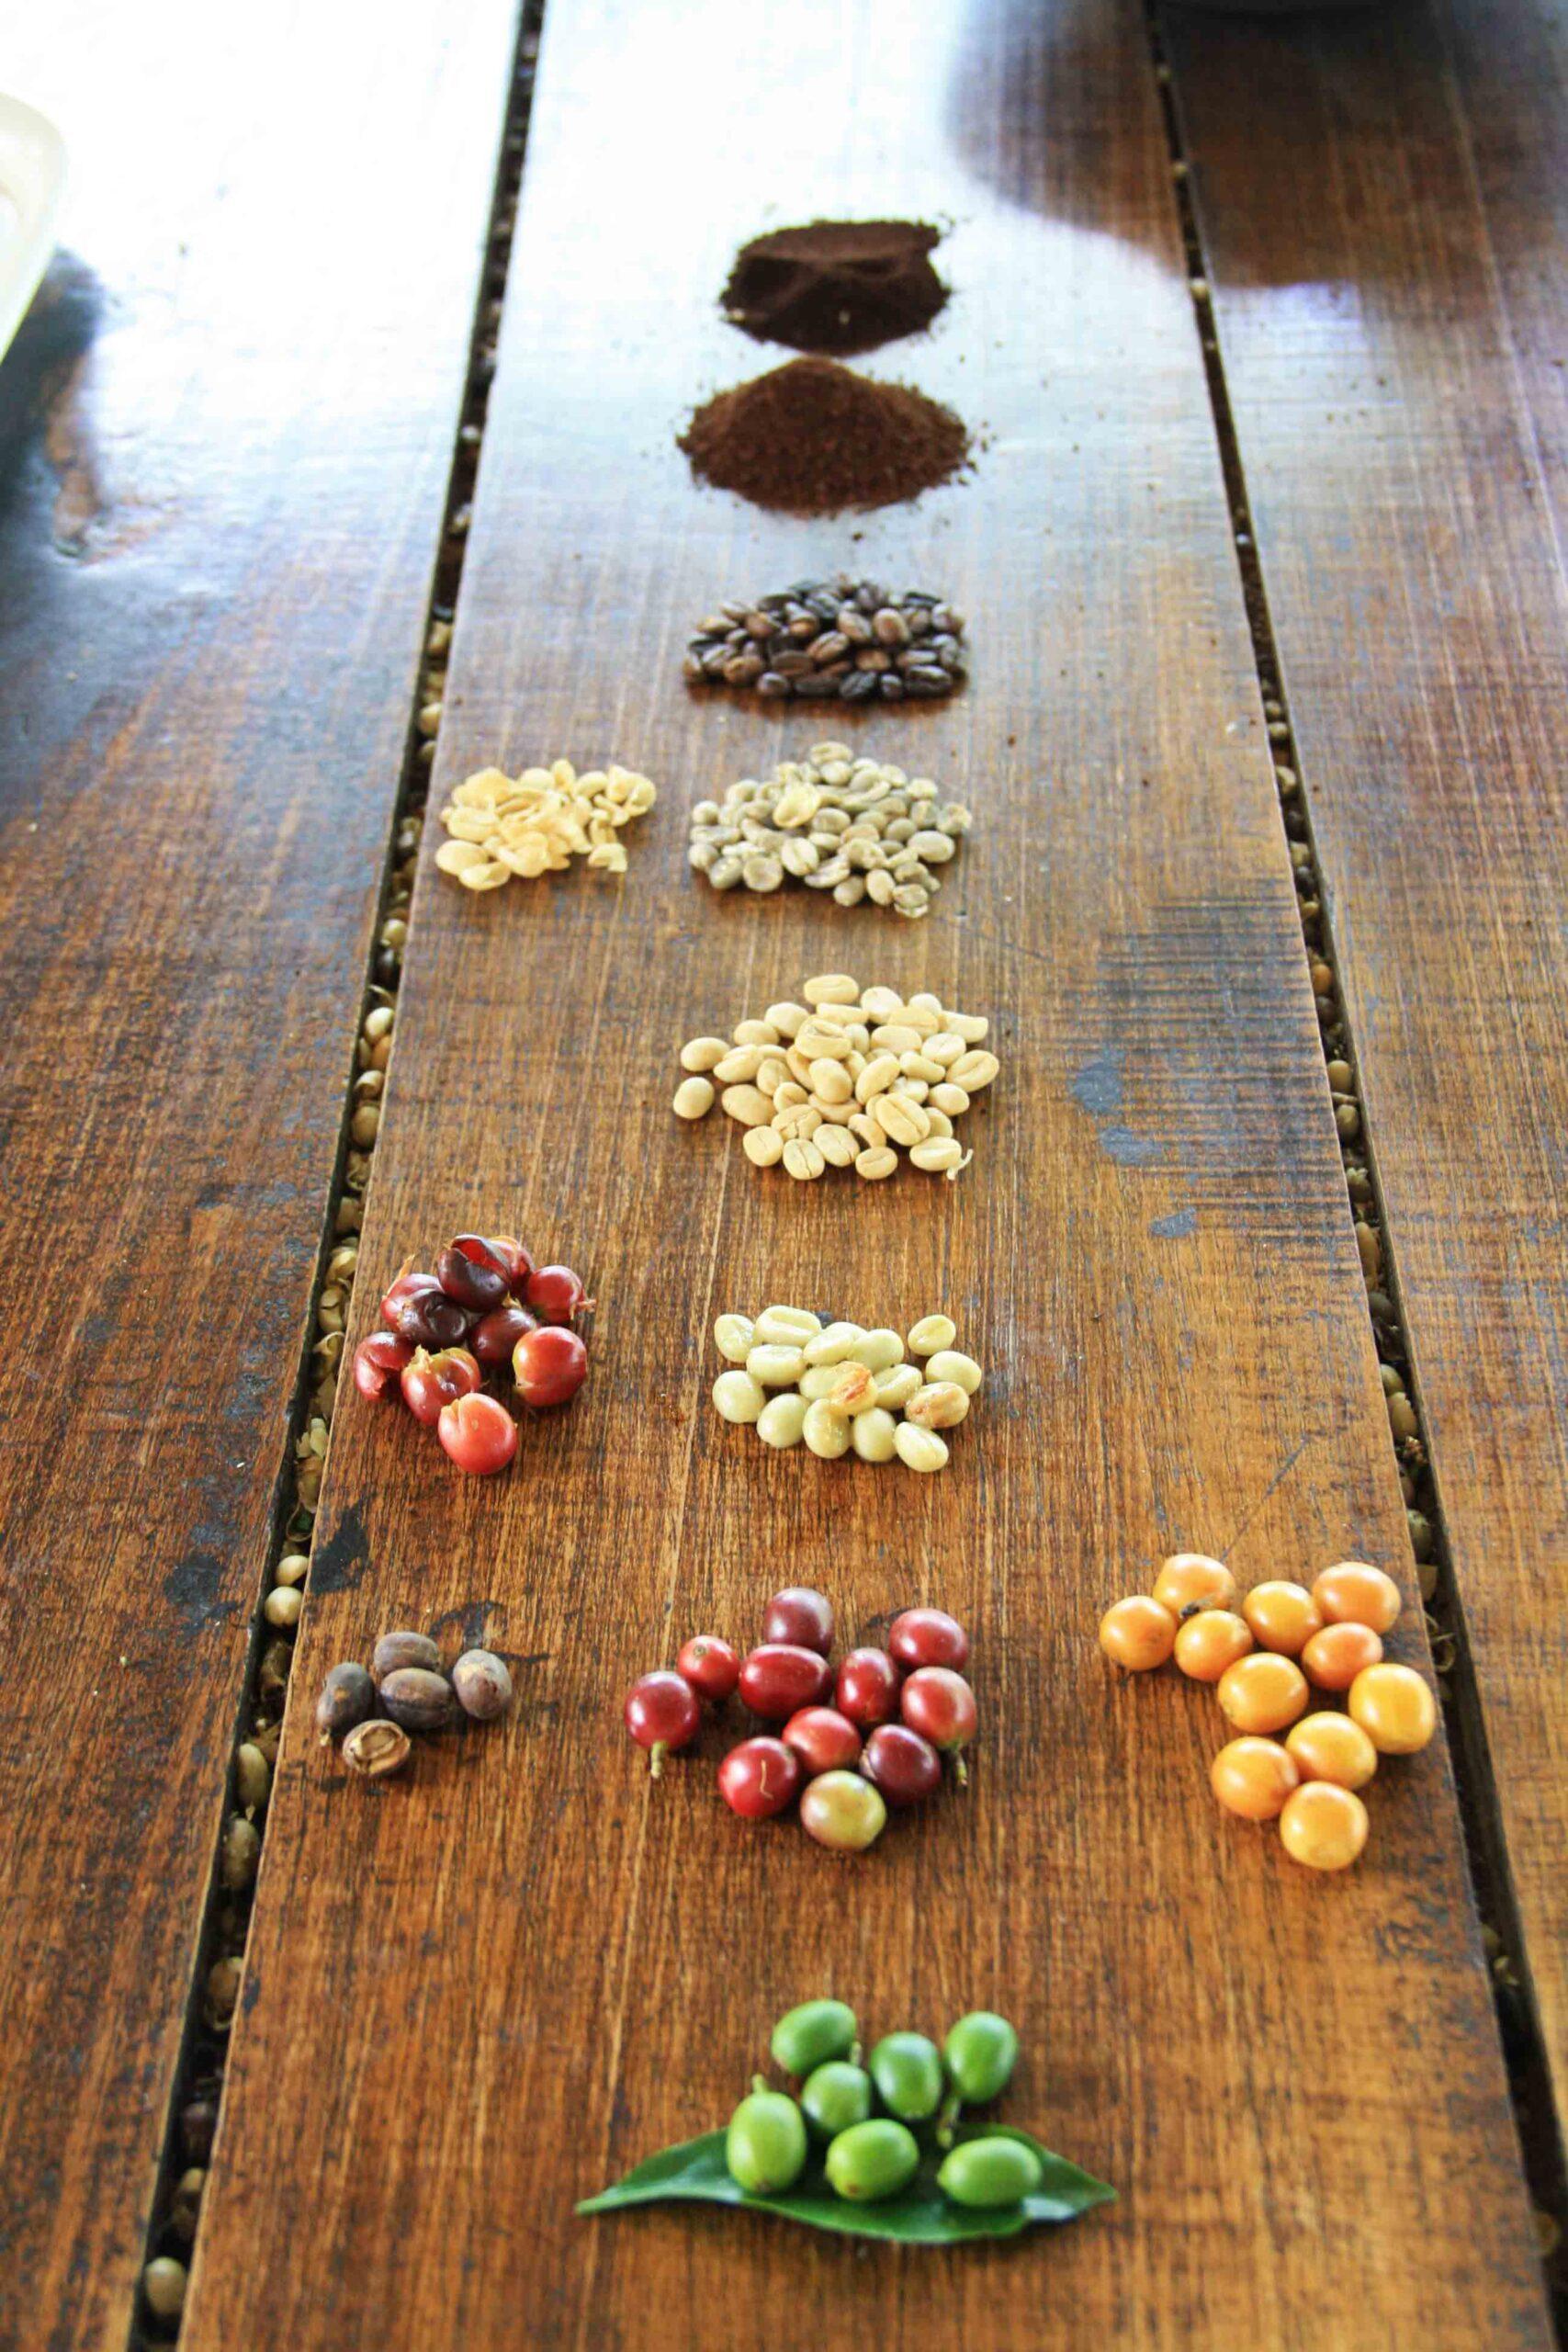 coffee bean process on the coffee farm